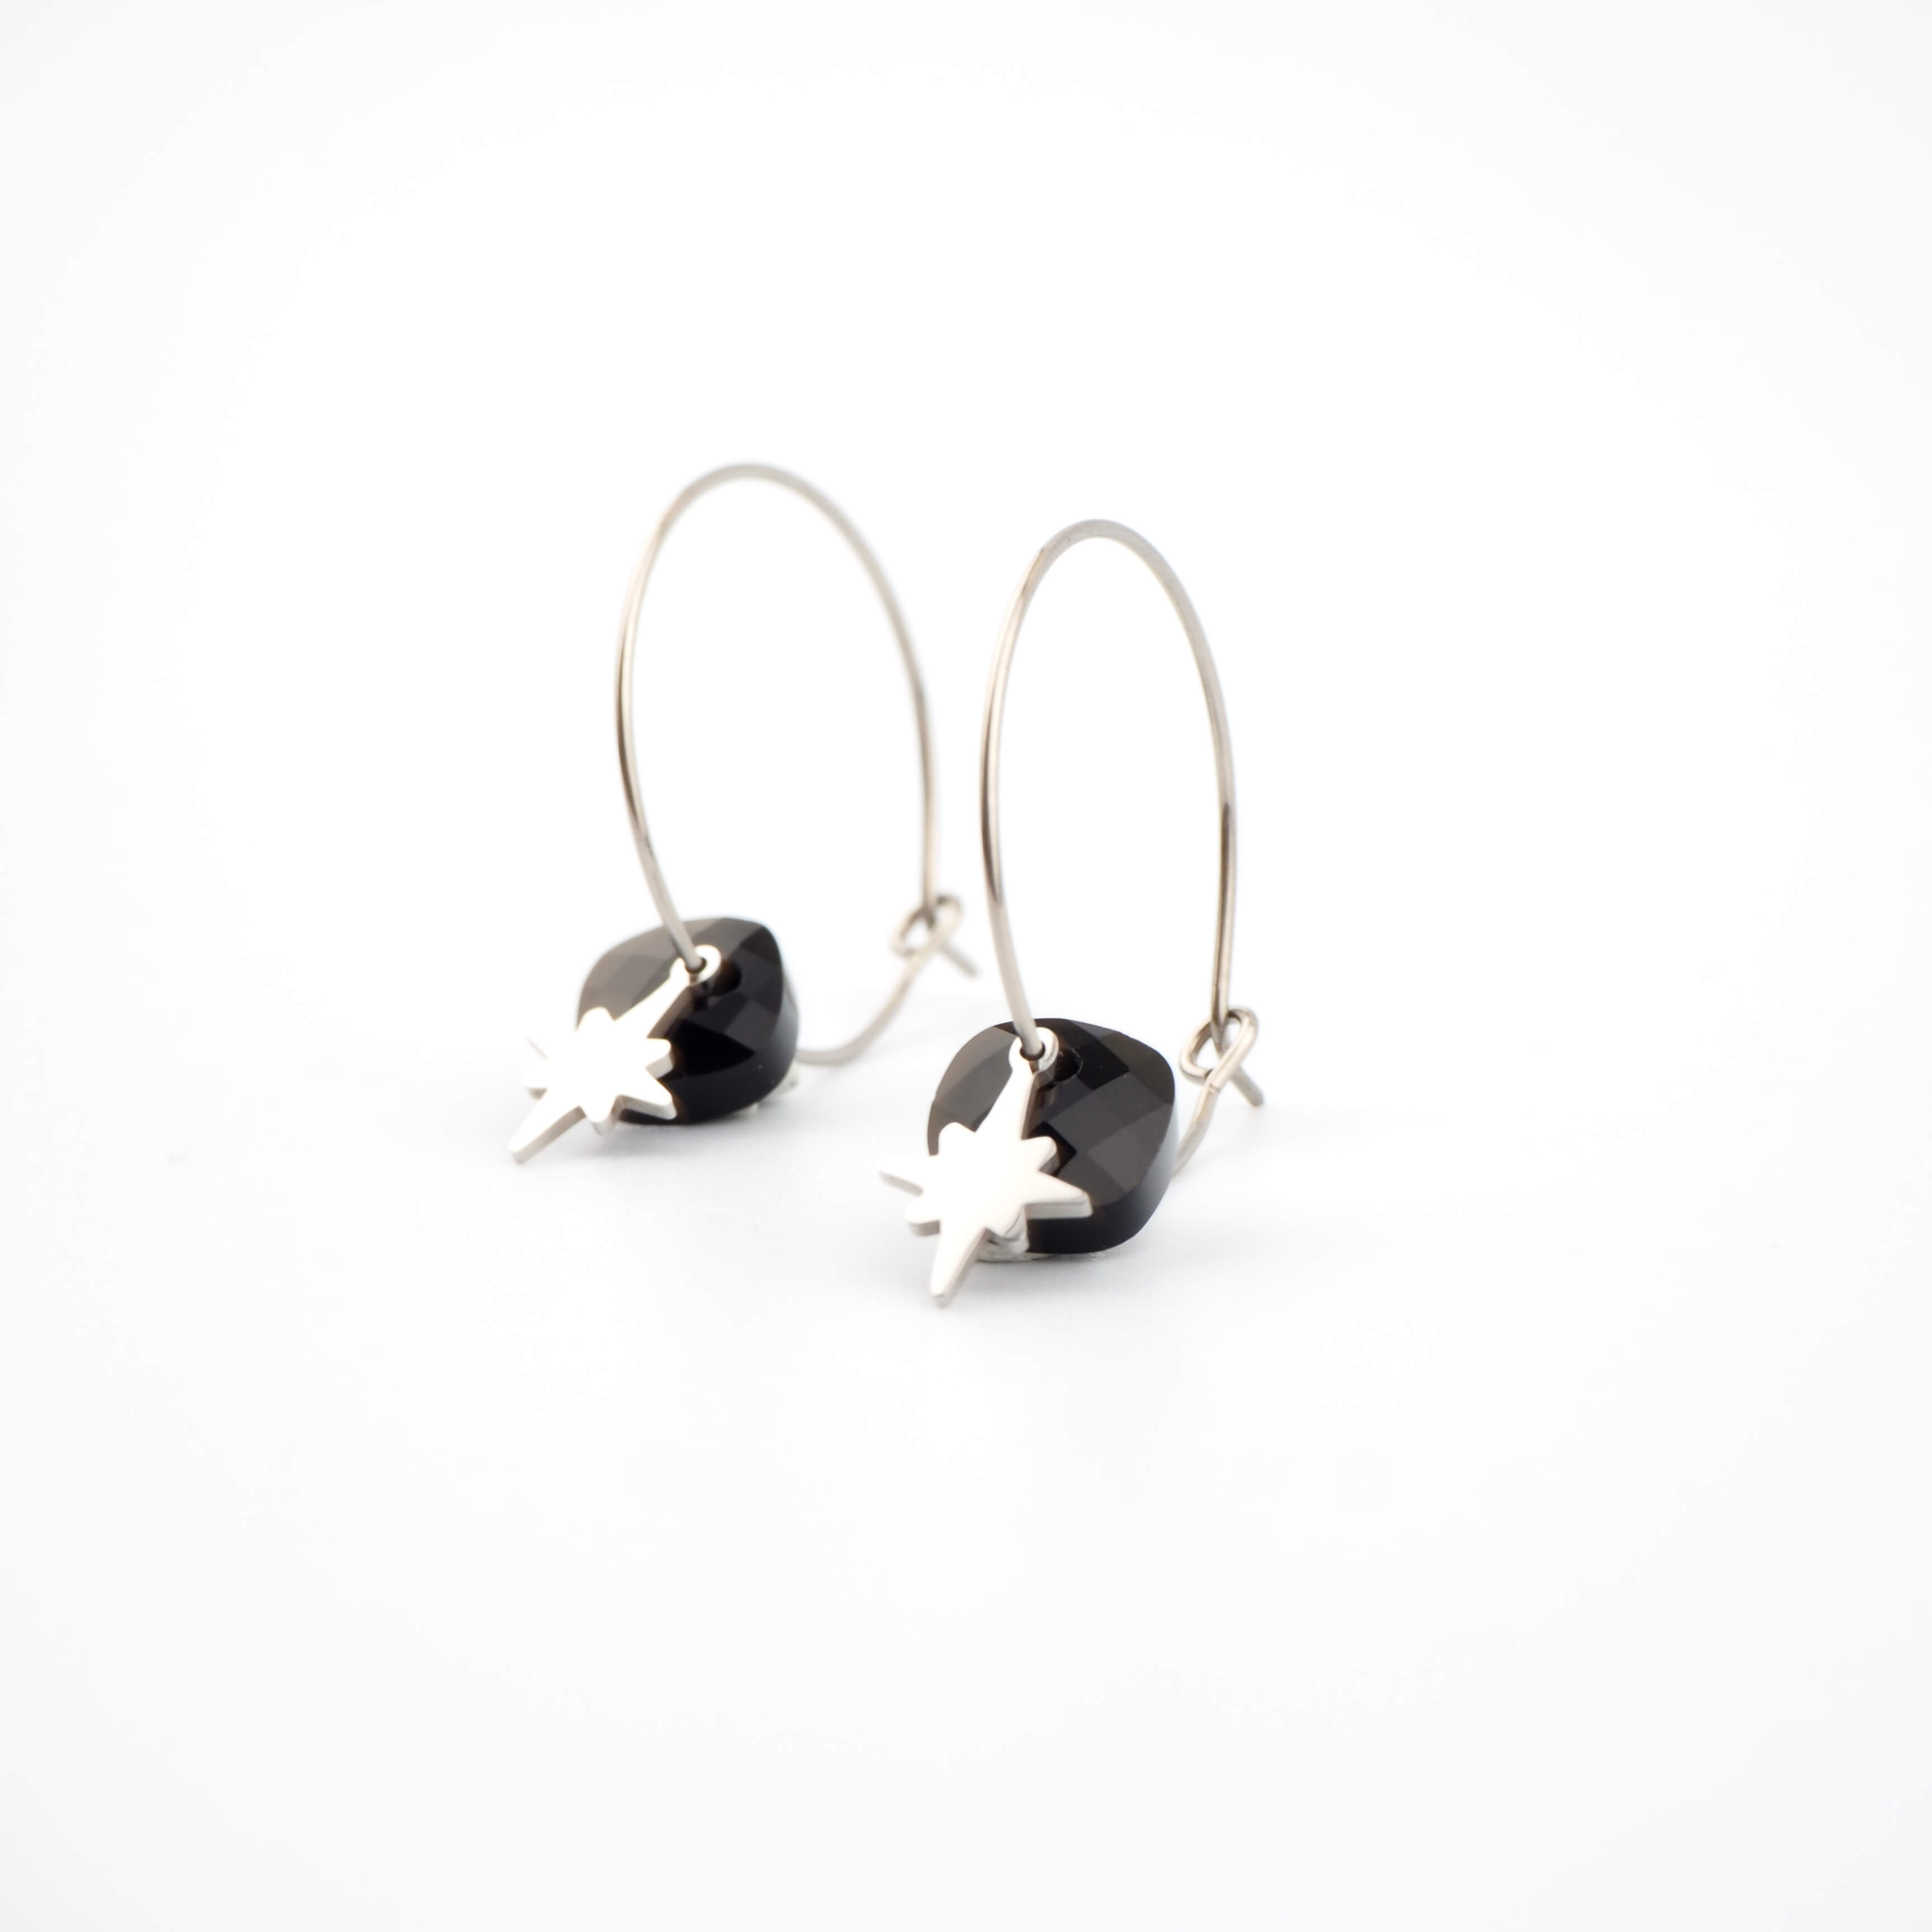 Boucles d'oreilles créoles Théa onyx - Zag Bijoux